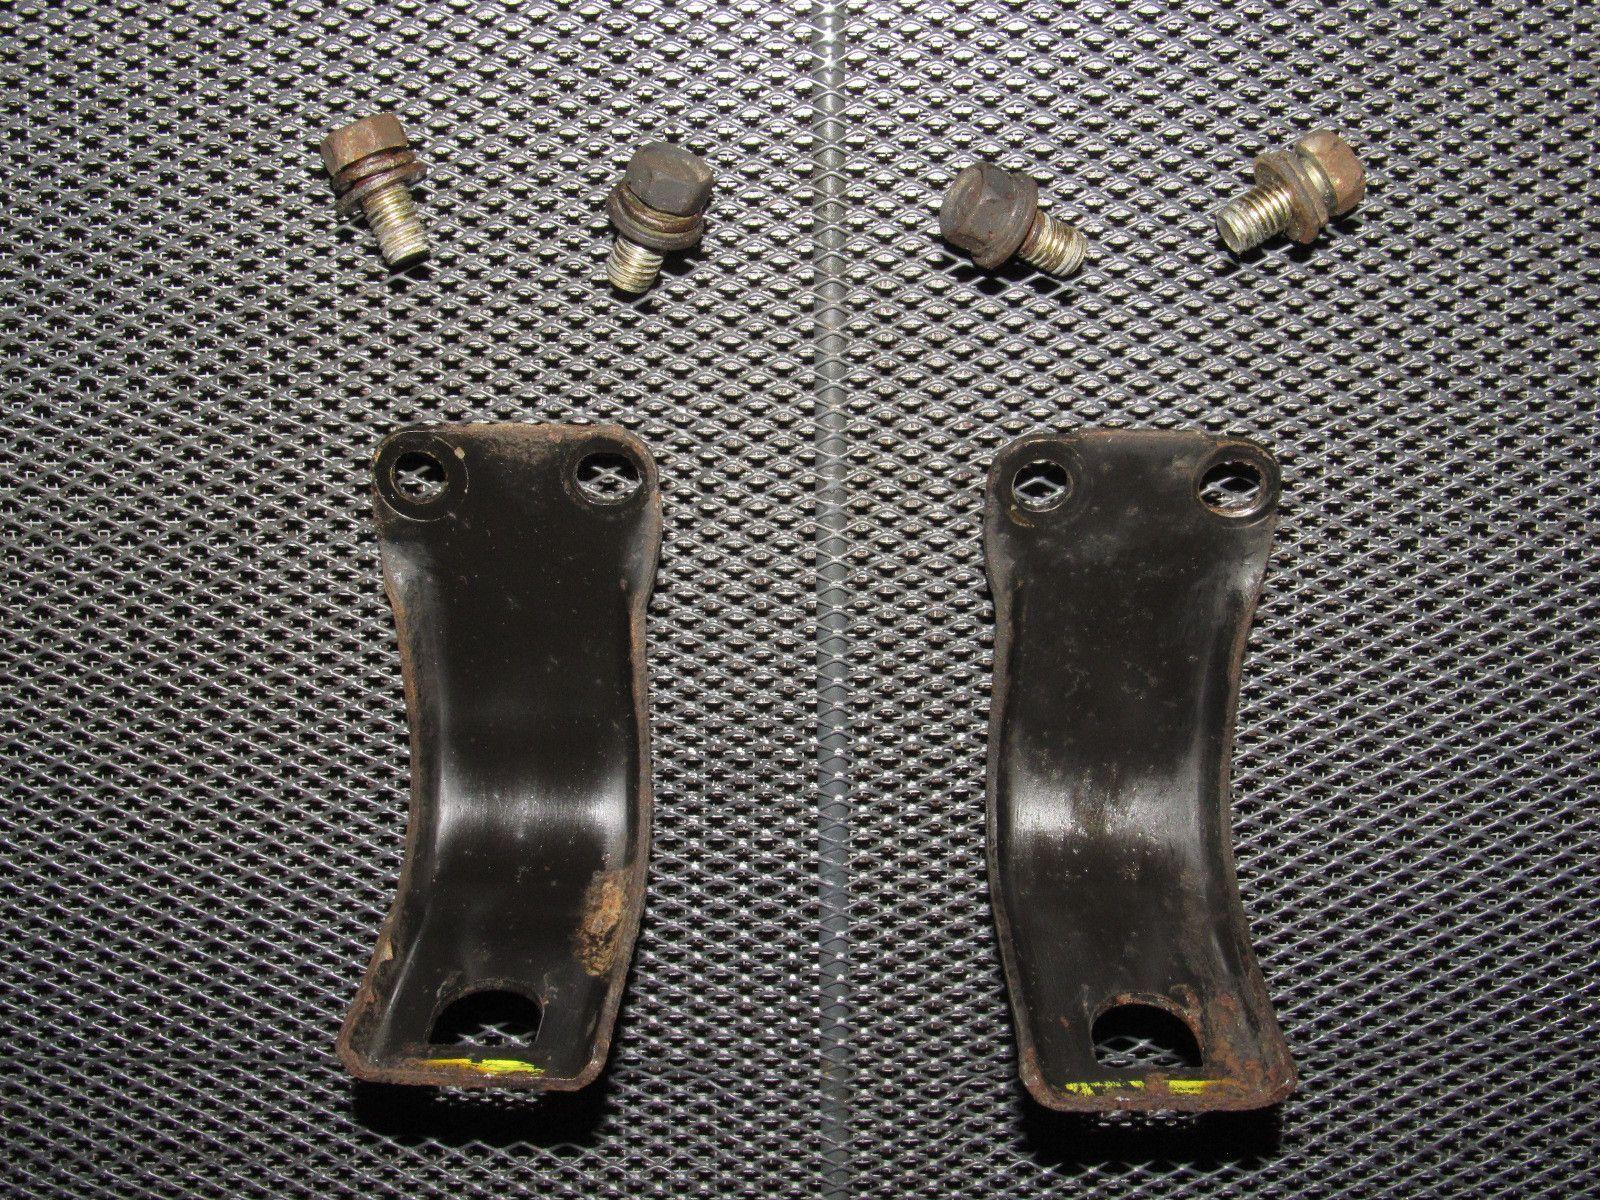 01 02 03 Acura Cl Oem Rear Brake Hose Holder Bracket Autopartone V6 Fuse Box